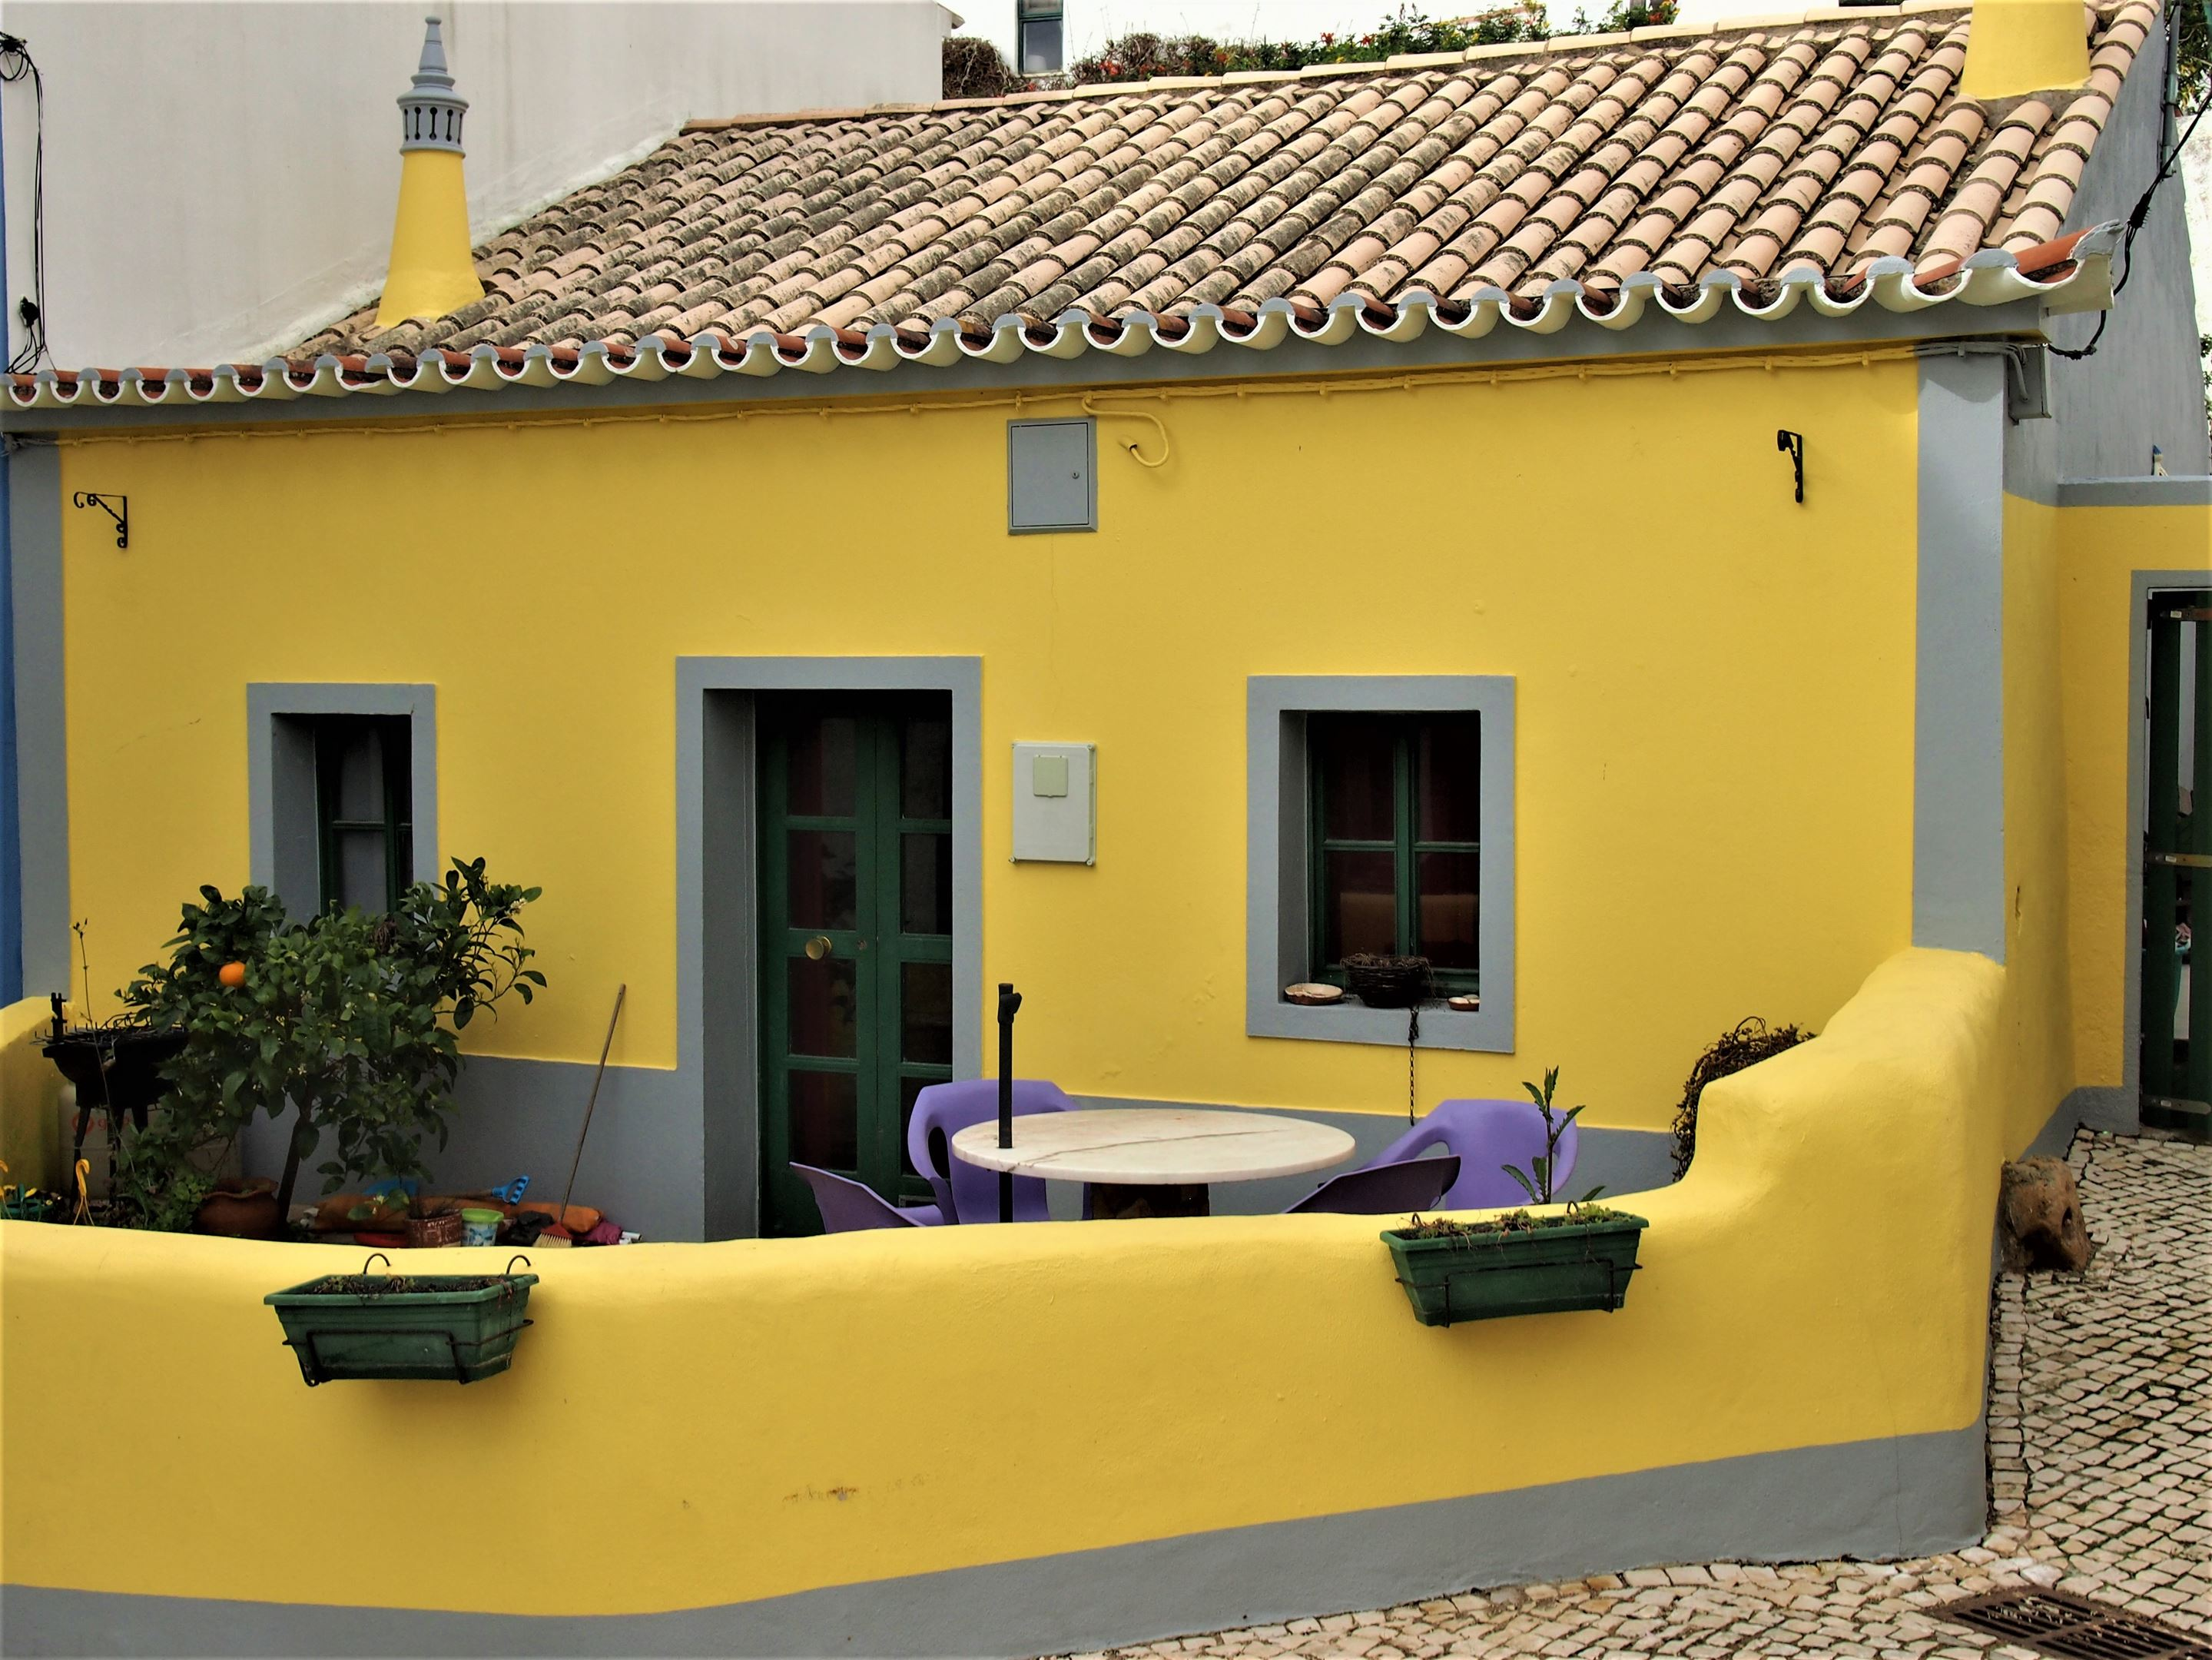 Accommodation at Burgau, Algarve